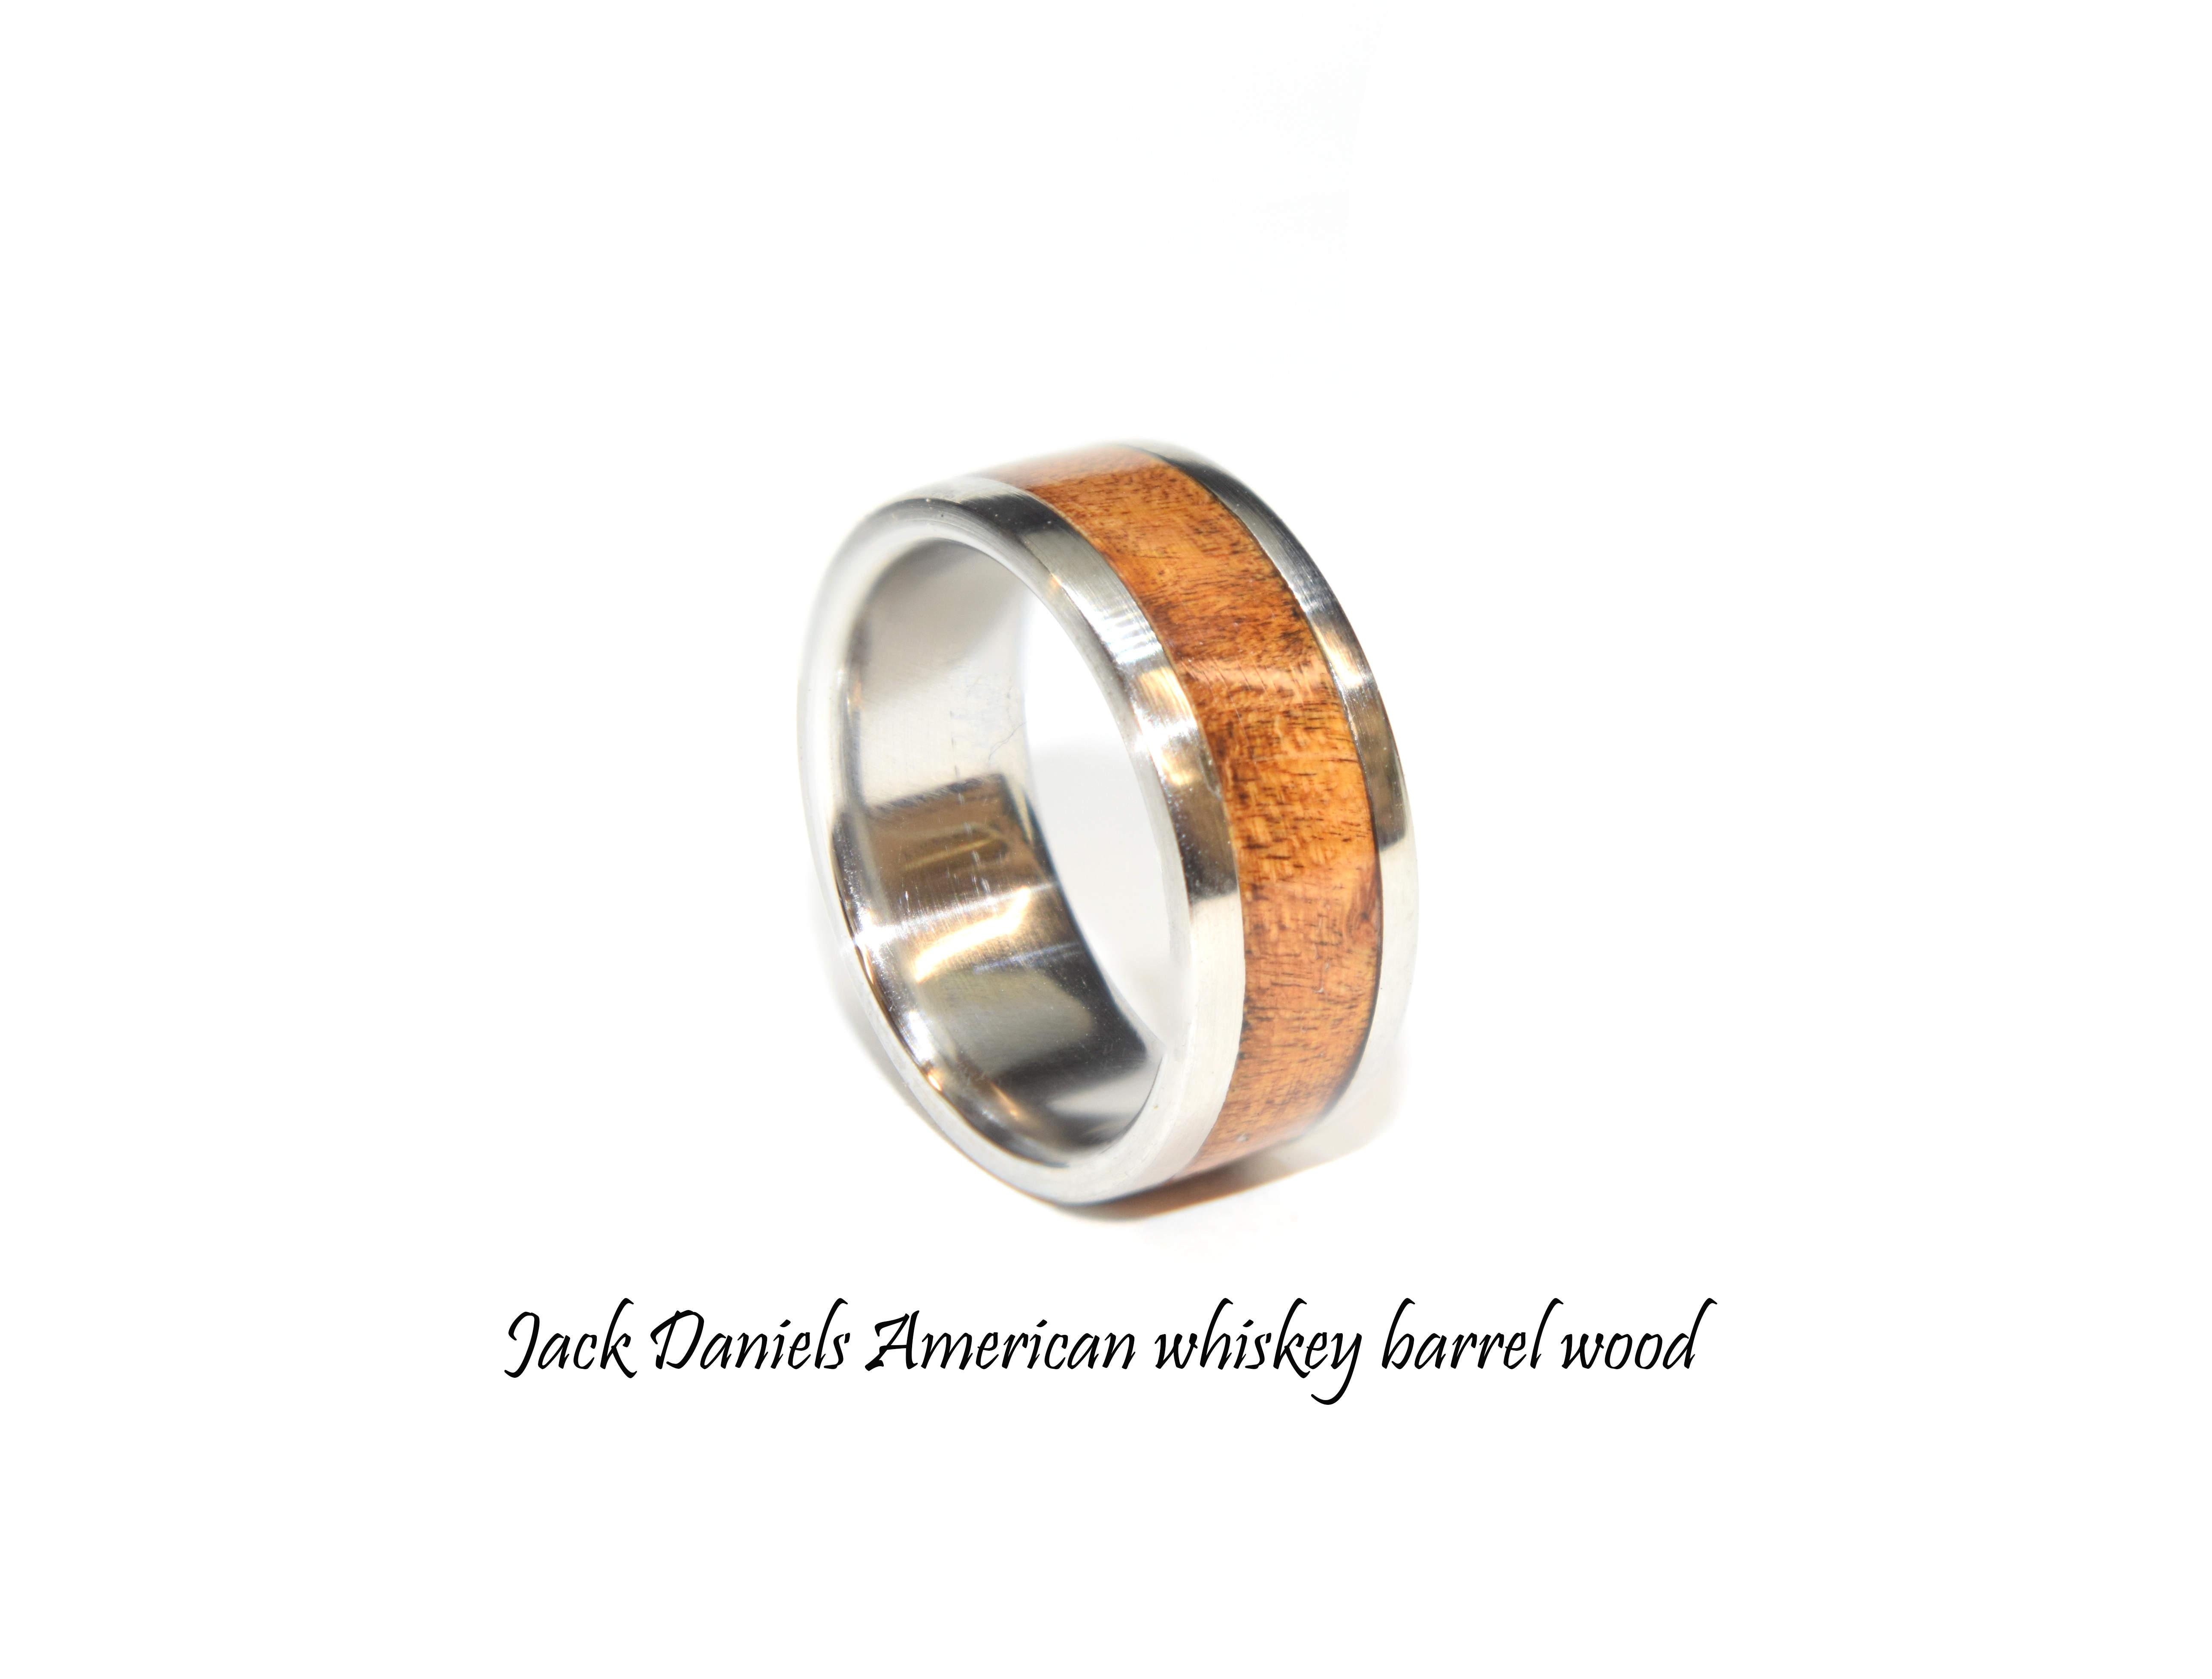 Jack Daniels ring whiskey barrel wood rings for men and women